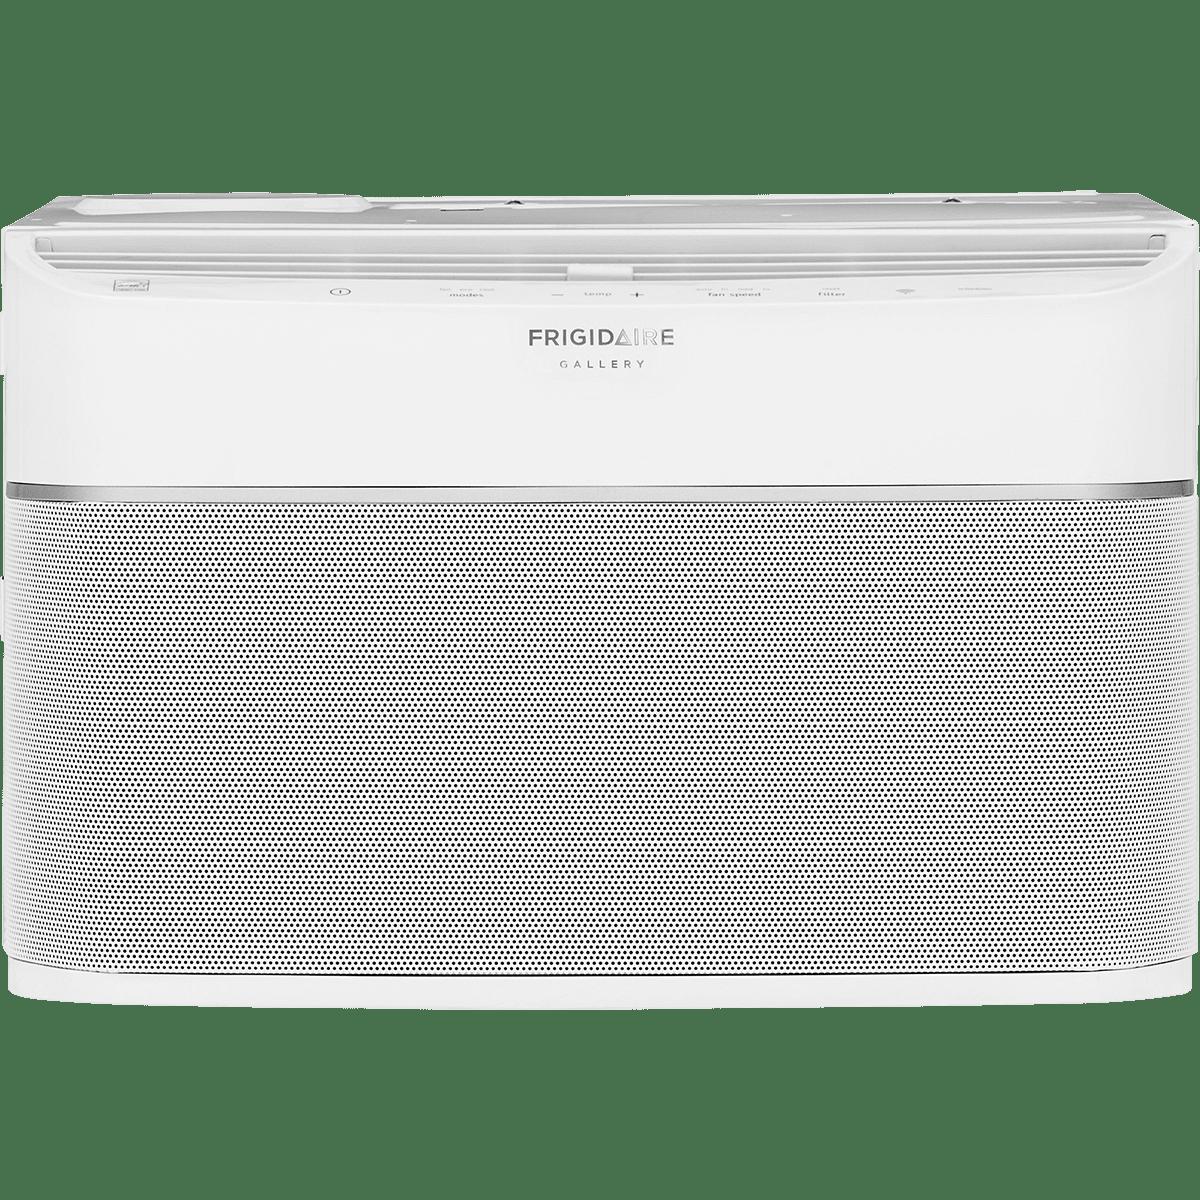 Frigidaire FGRC1044T1 10,000 BTU Window Air Conditioner